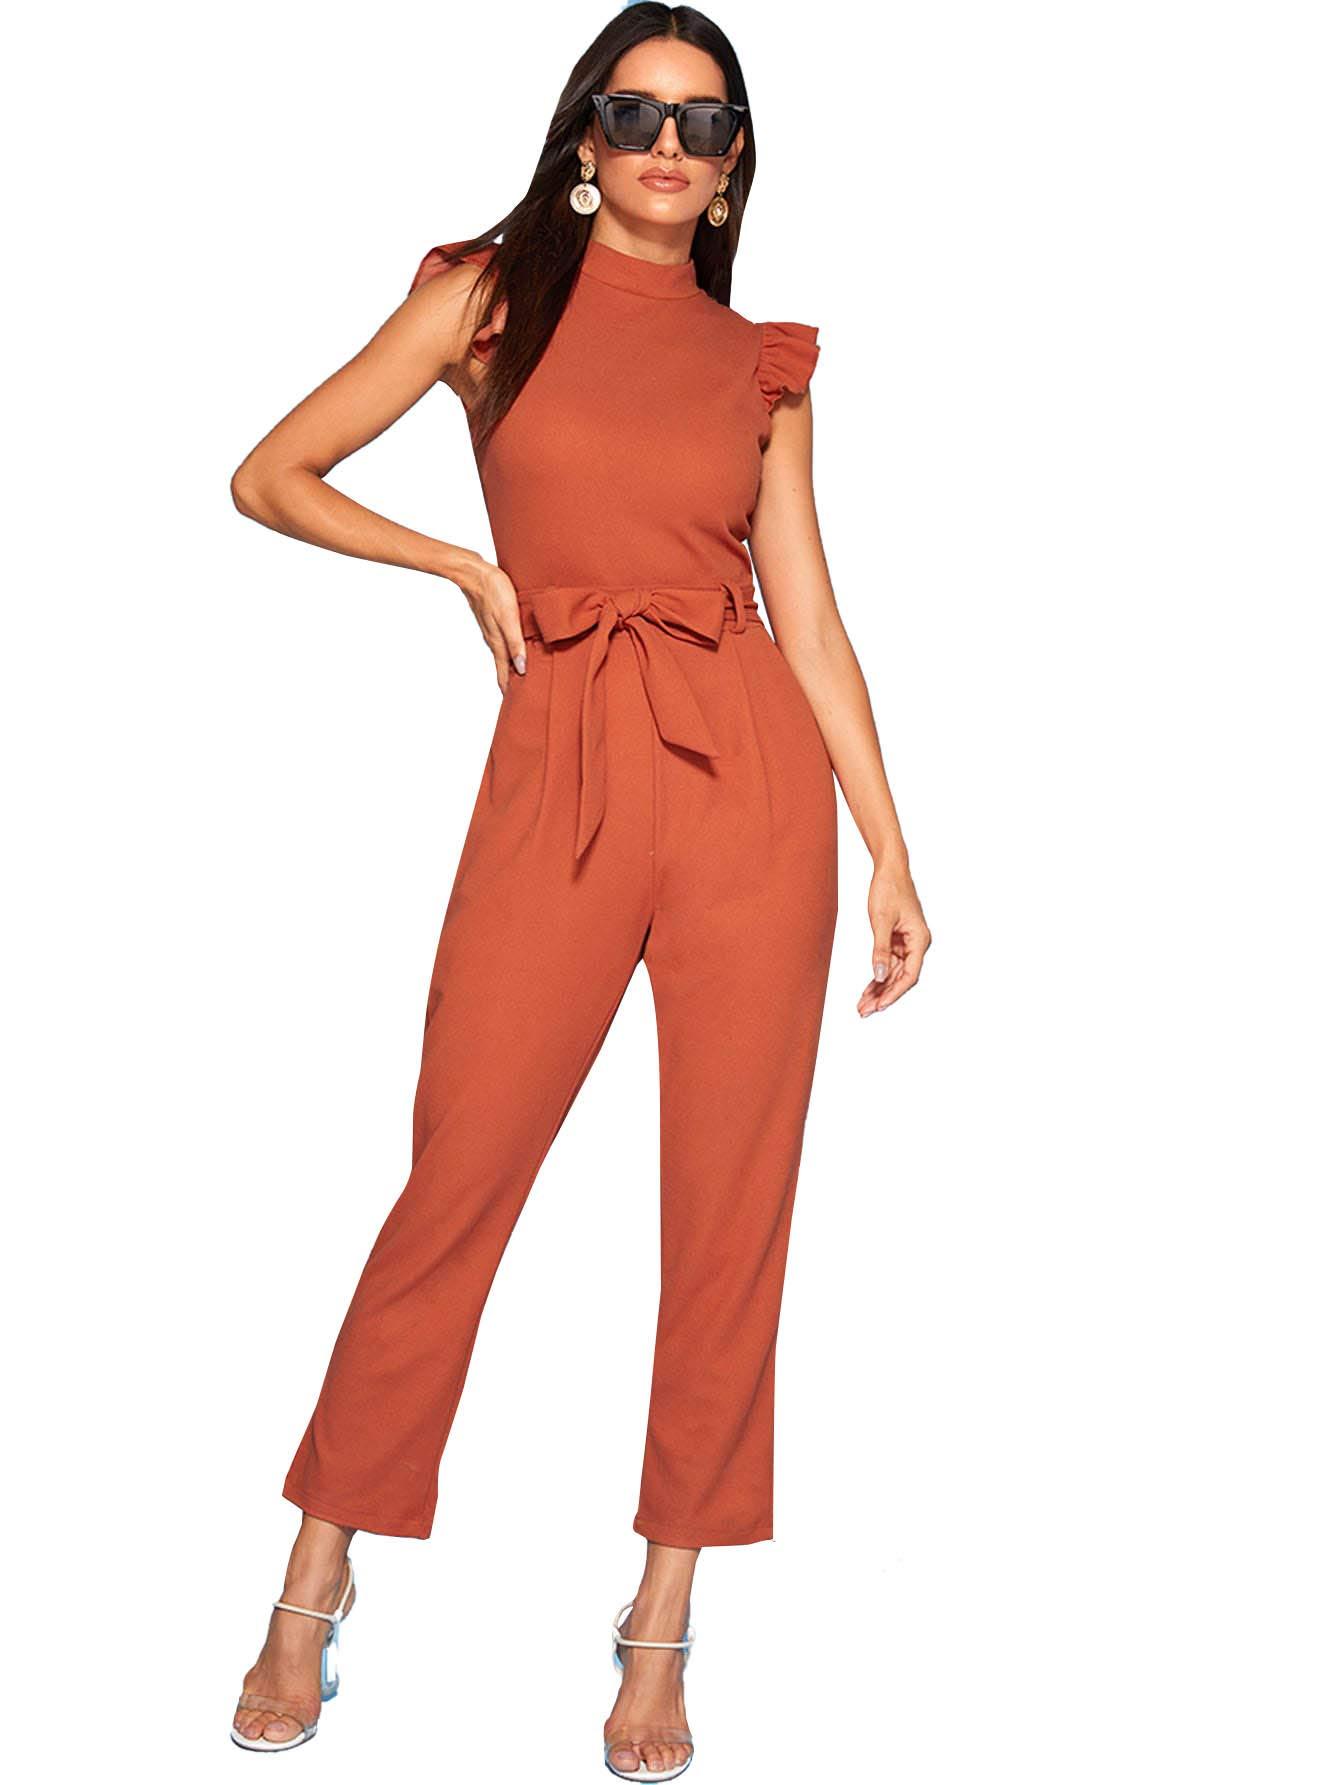 WDIRARA Women's Elegant Zip Back Short Sleeve Lace Bodice Wide Leg Jumpsuit